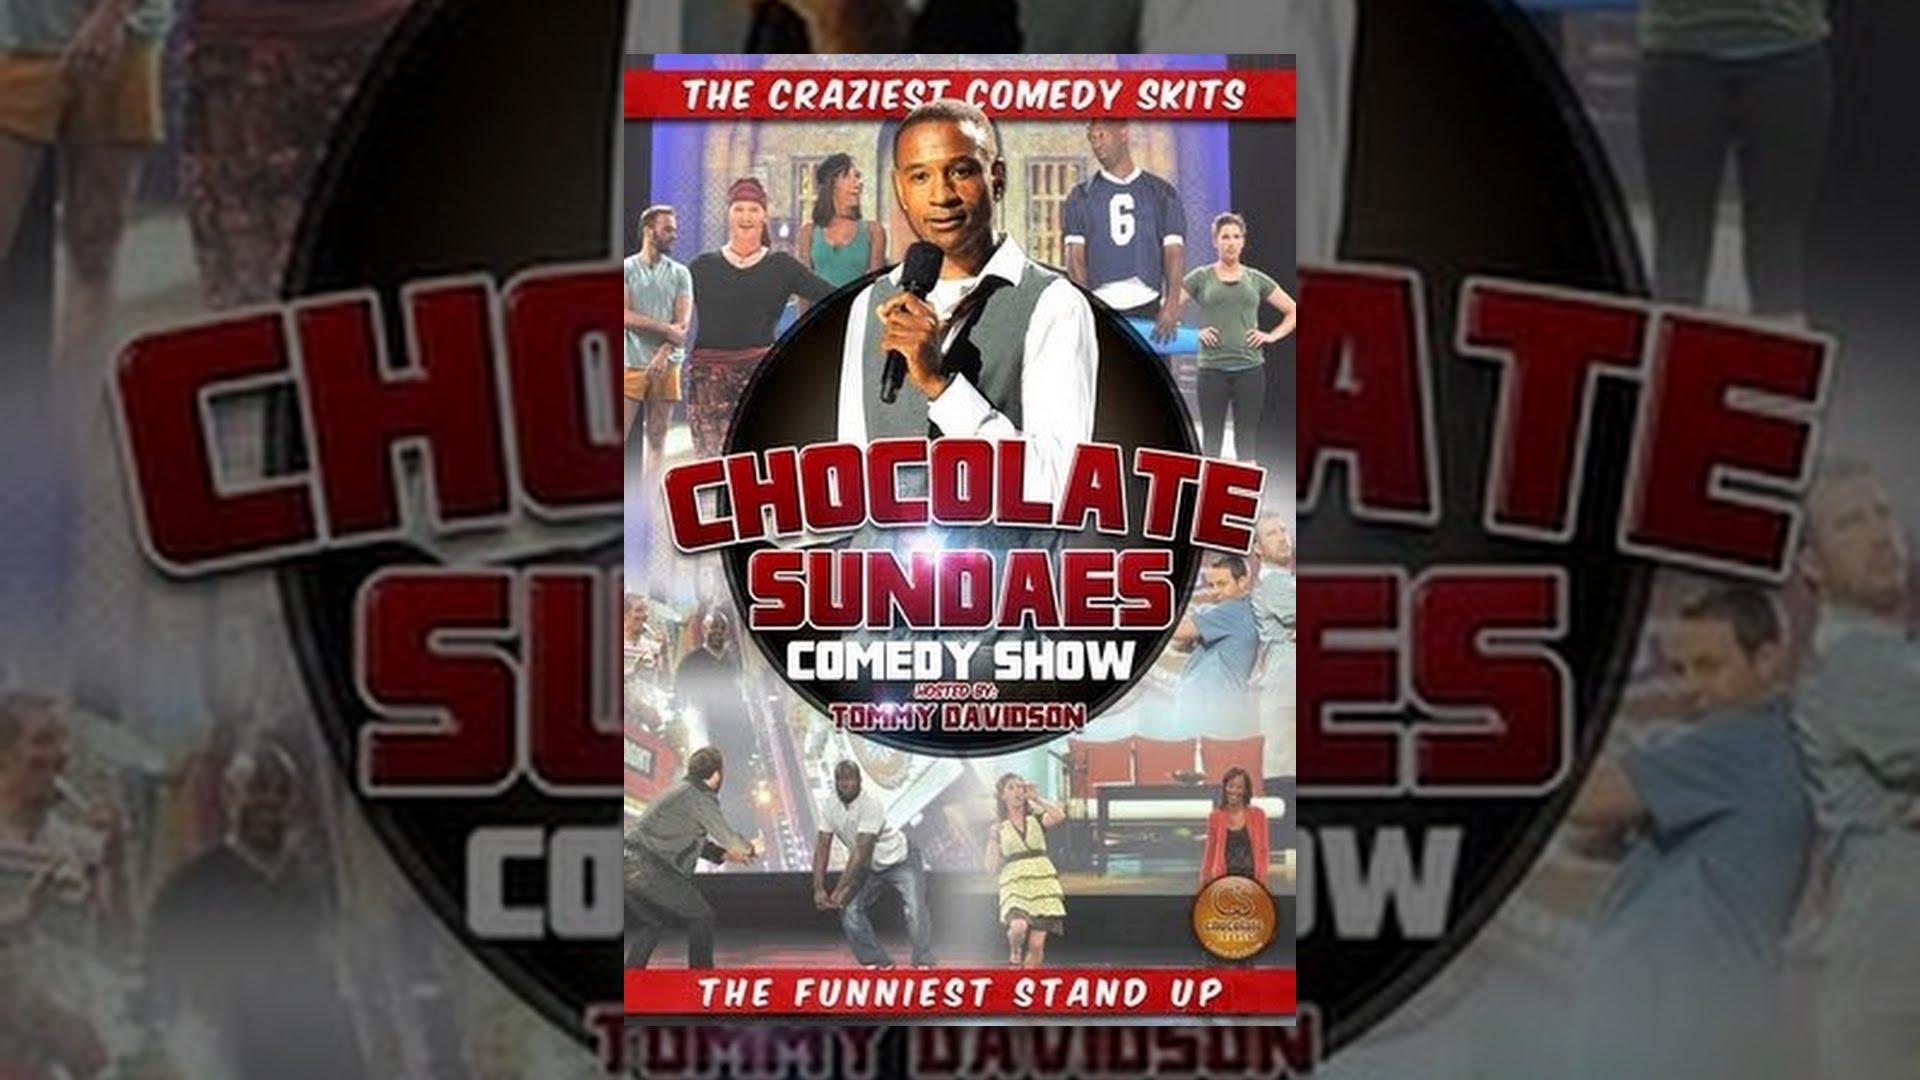 Chocolate Sundaes Comedy Show